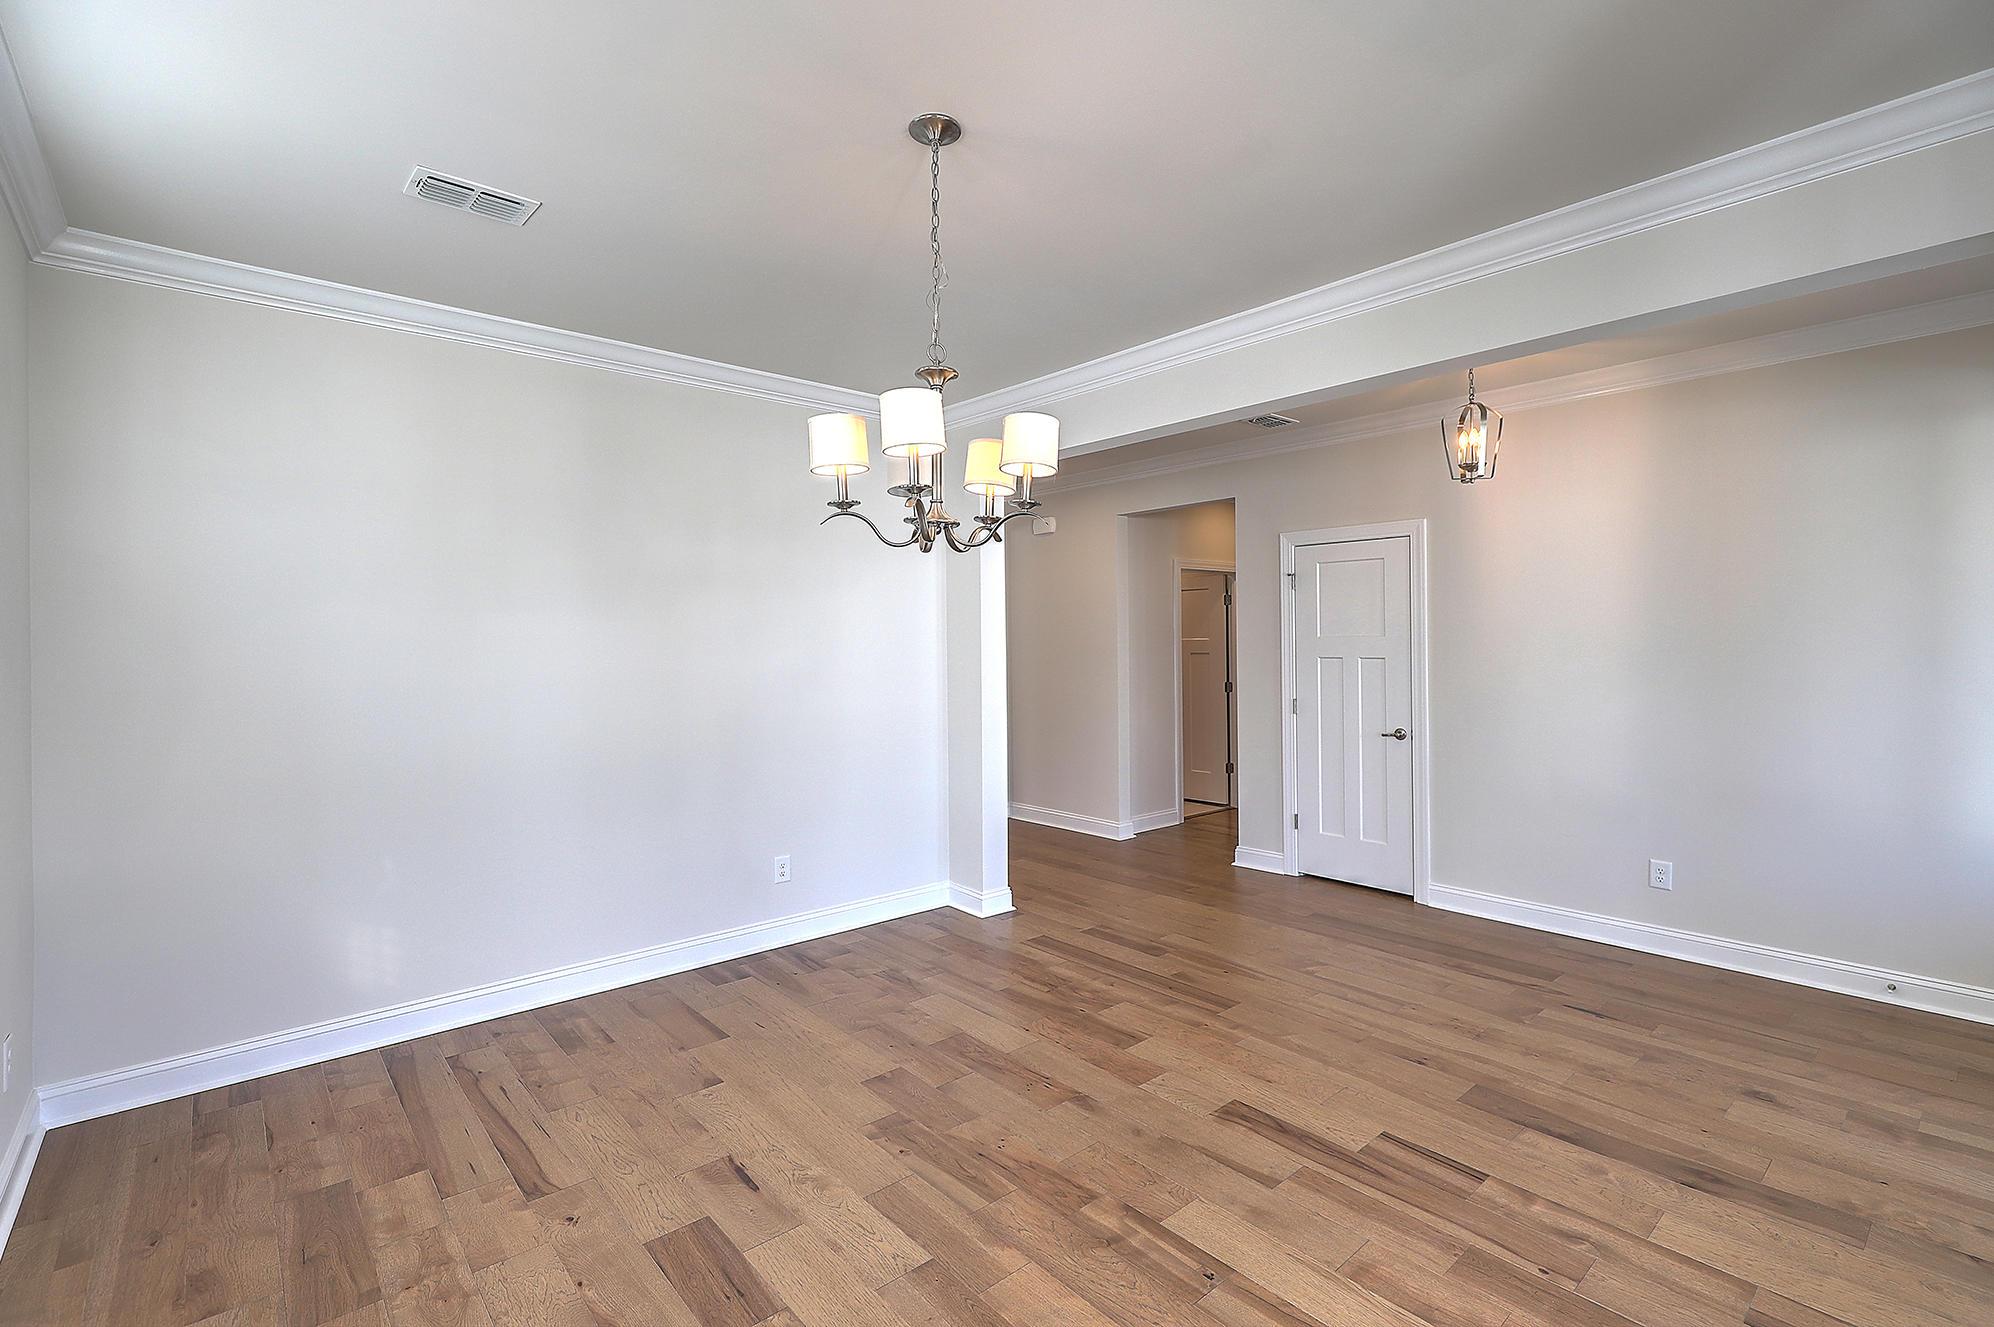 Bentley Park Homes For Sale - 1261 Gannett, Mount Pleasant, SC - 18